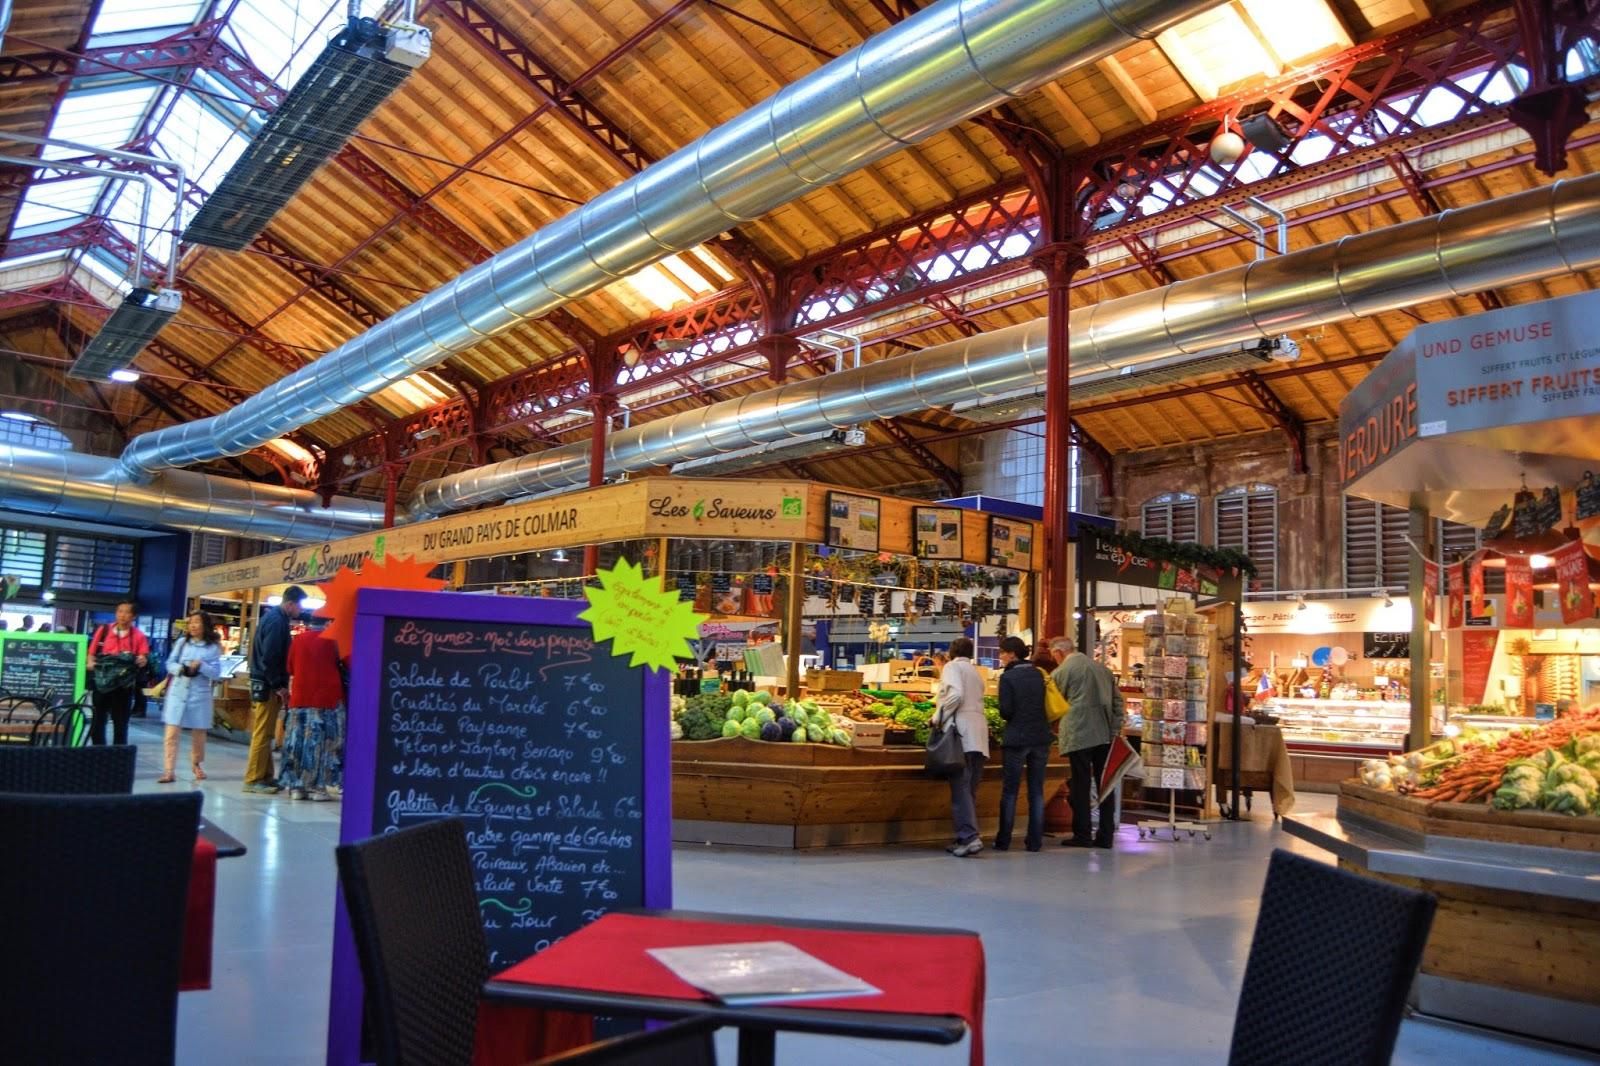 Exploring colmar a fairytale town in europe - Colmar cuisine creation ...